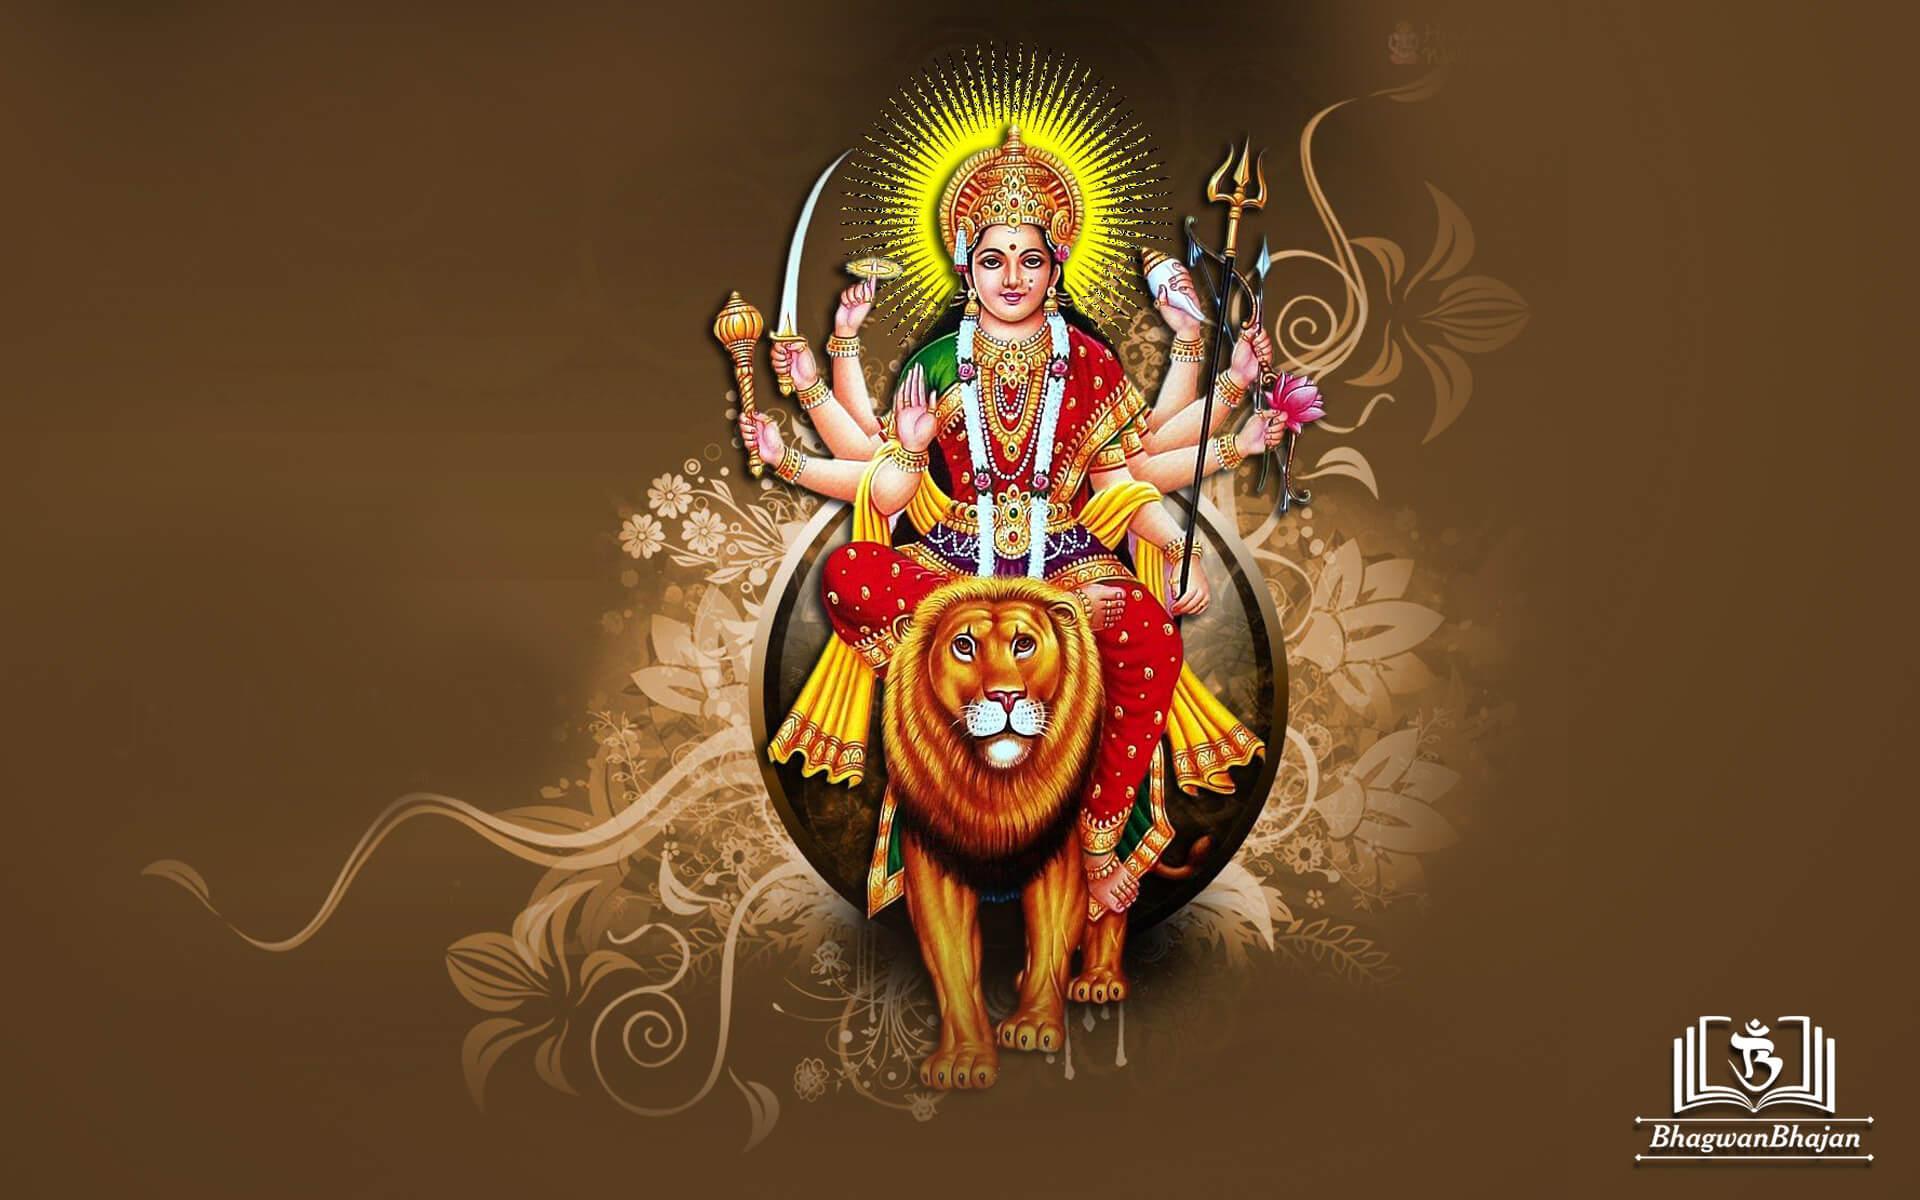 Best HD Image of Maa Durga Navratri